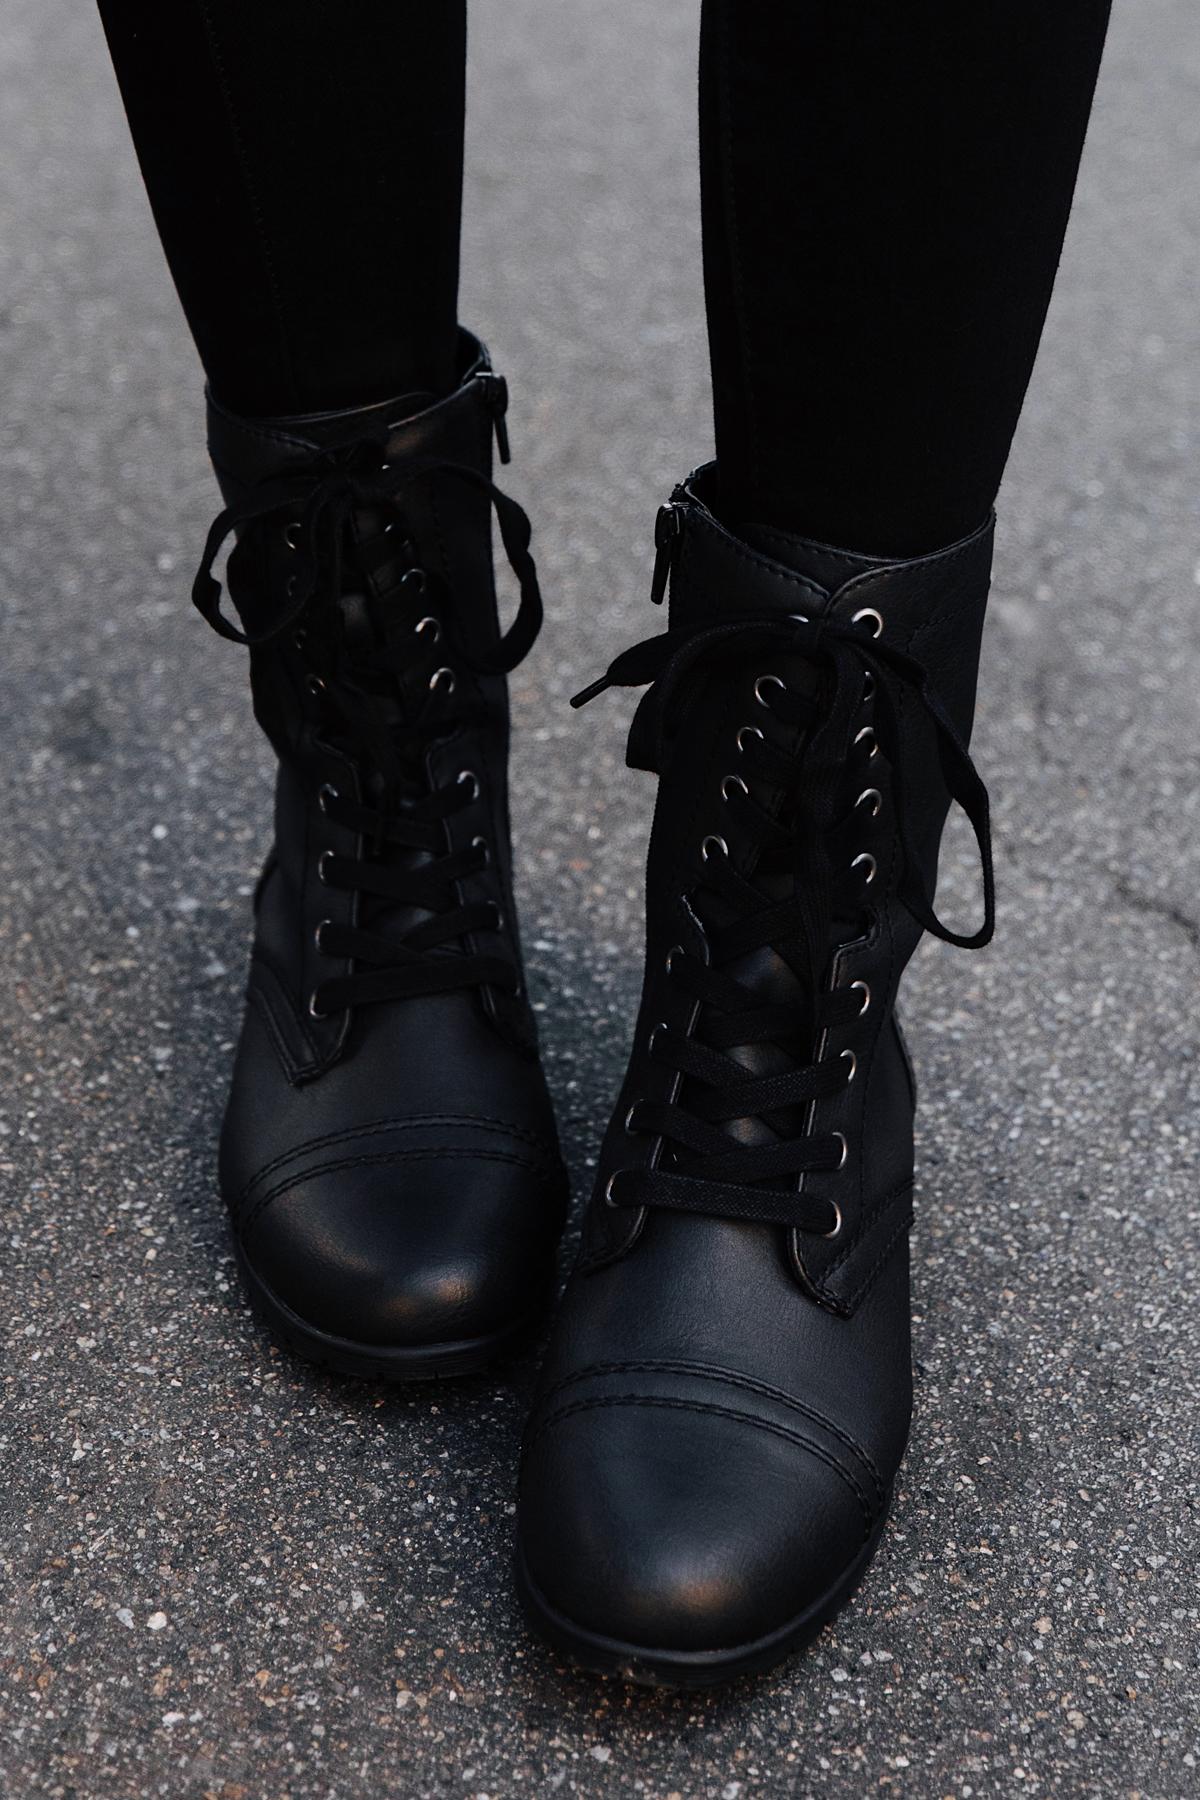 Fashion Jackson Wearing Walmart Combat Boots